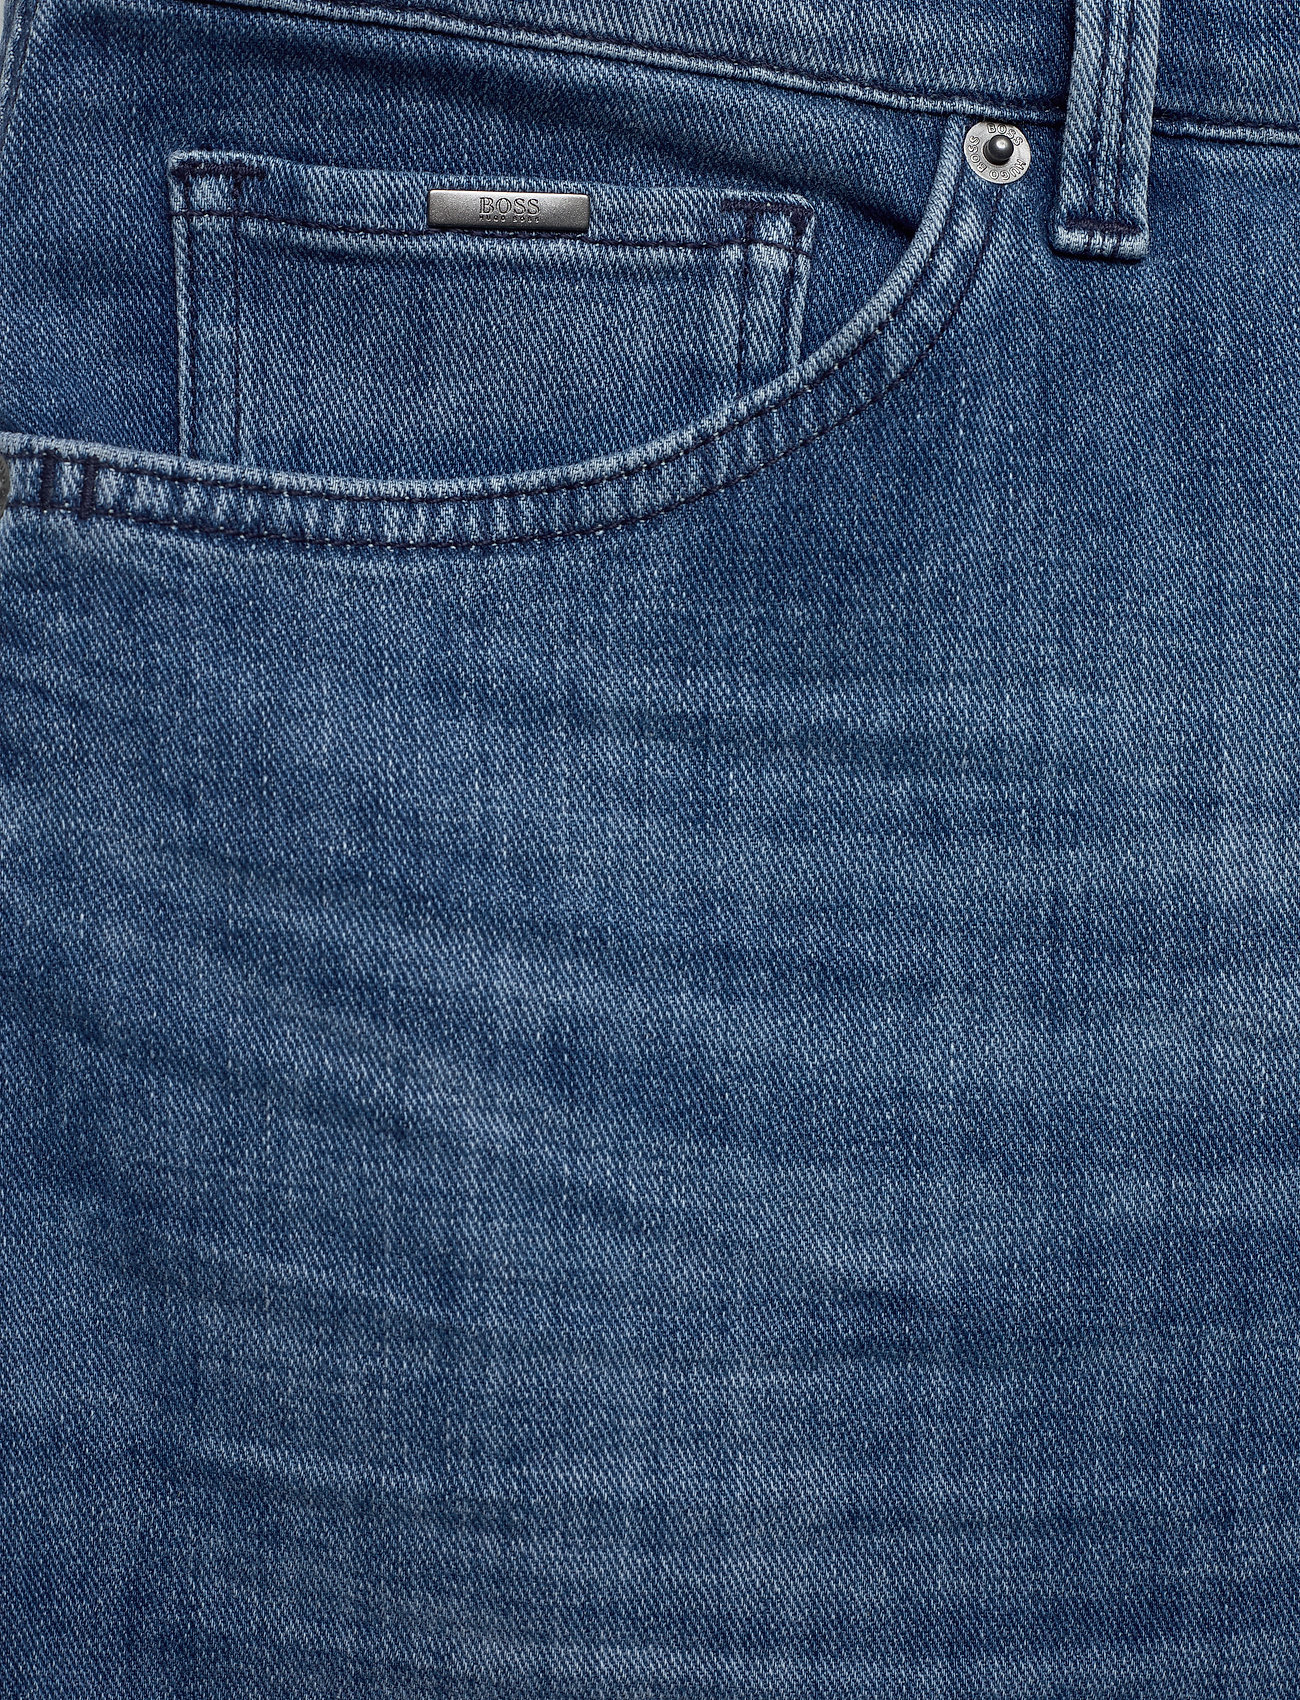 Boss Maine3+ - Jeans Turquoise/aqua